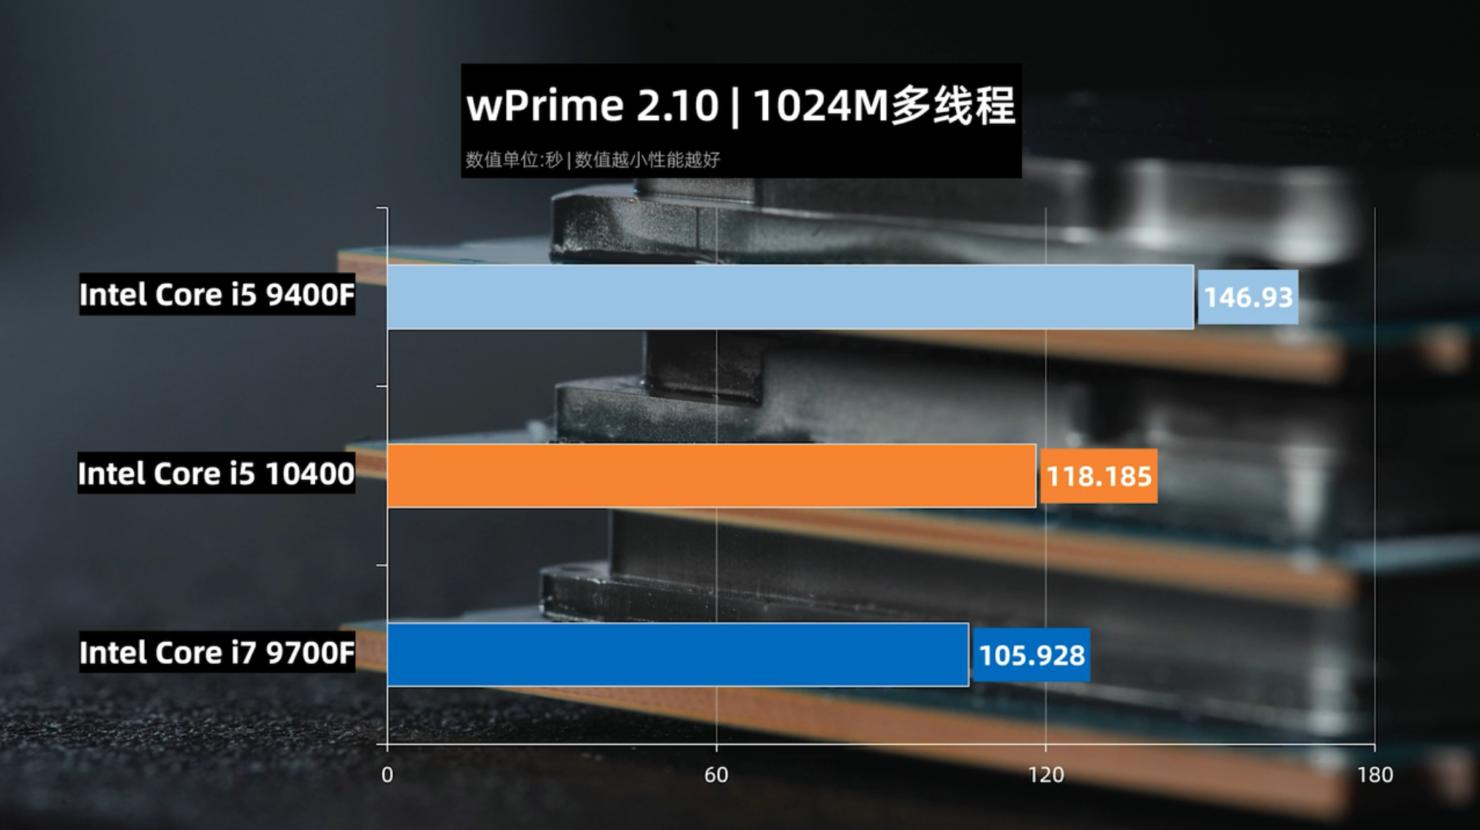 intel-core-i5-10400-comet-lake-s-6-core-desktop-cpu_wprim-1024m